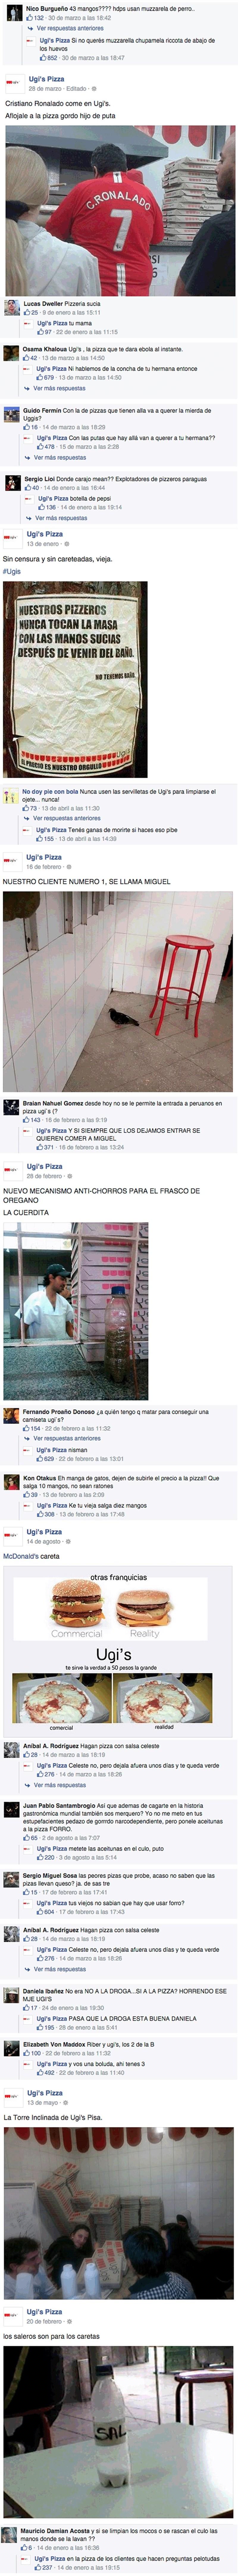 Ugis en argentina